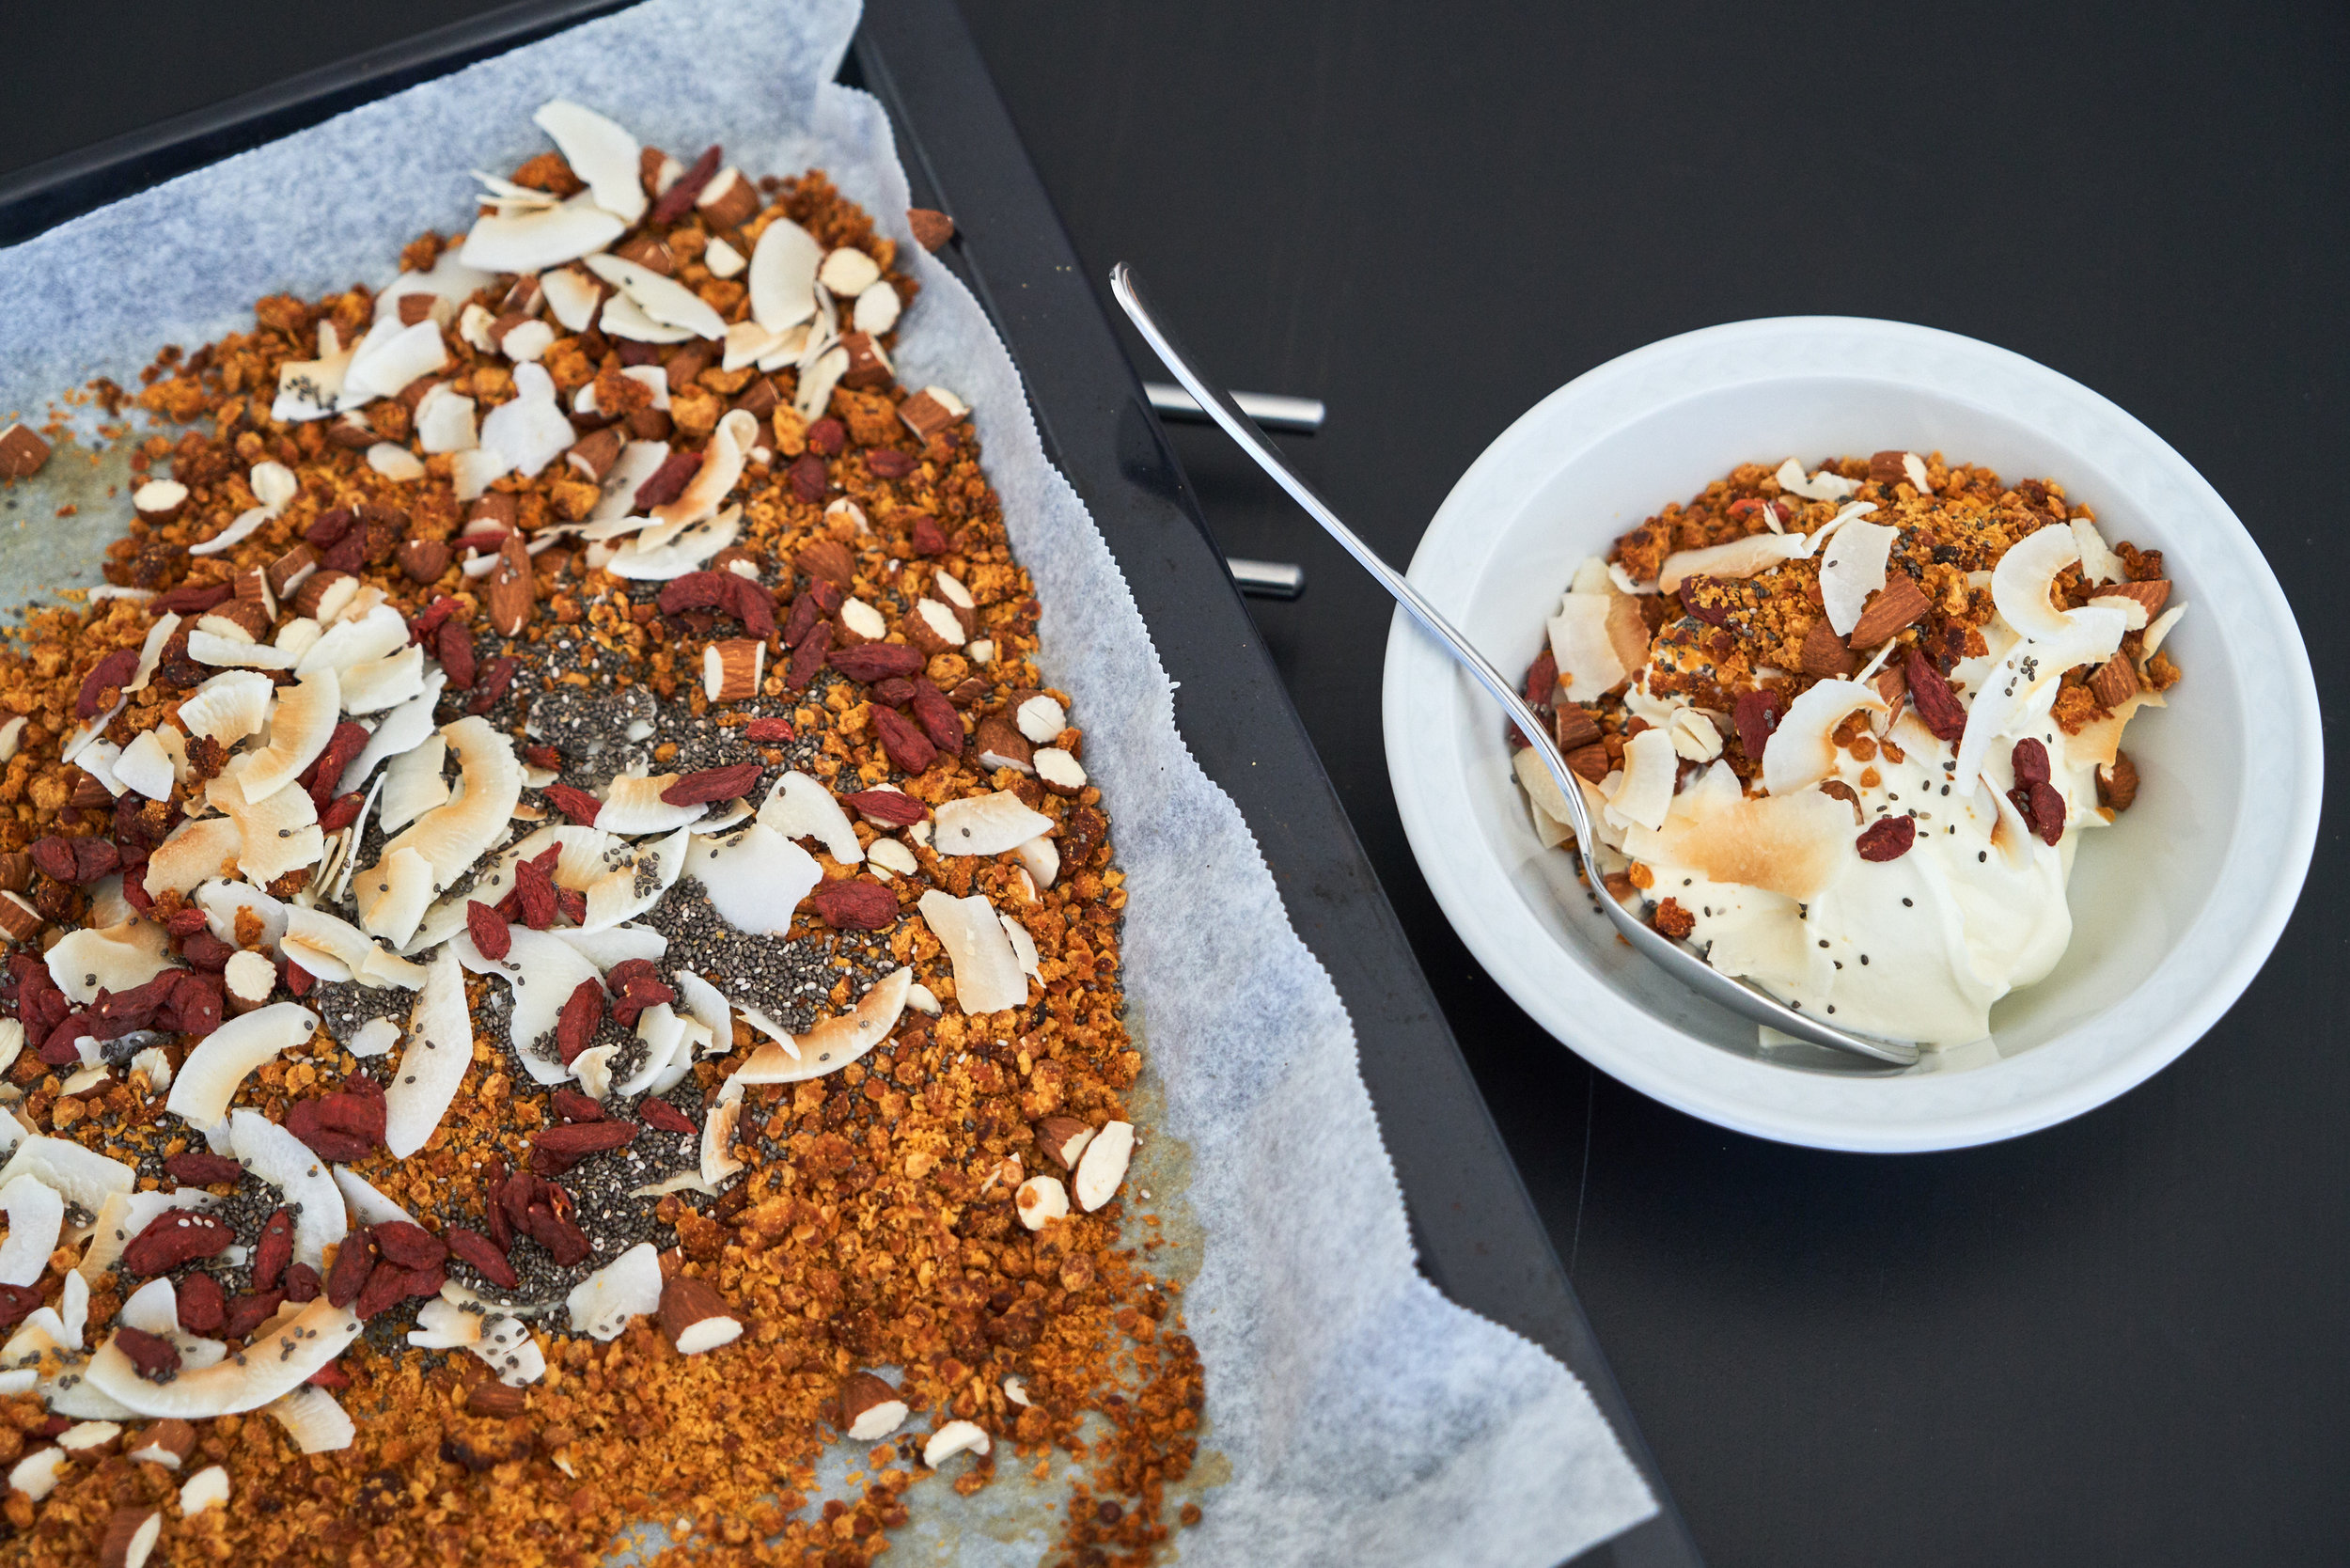 Lentil Granola for a Protein-Rich Breakfast - enjoy with Greek yogurt | In Carina's Kitchen